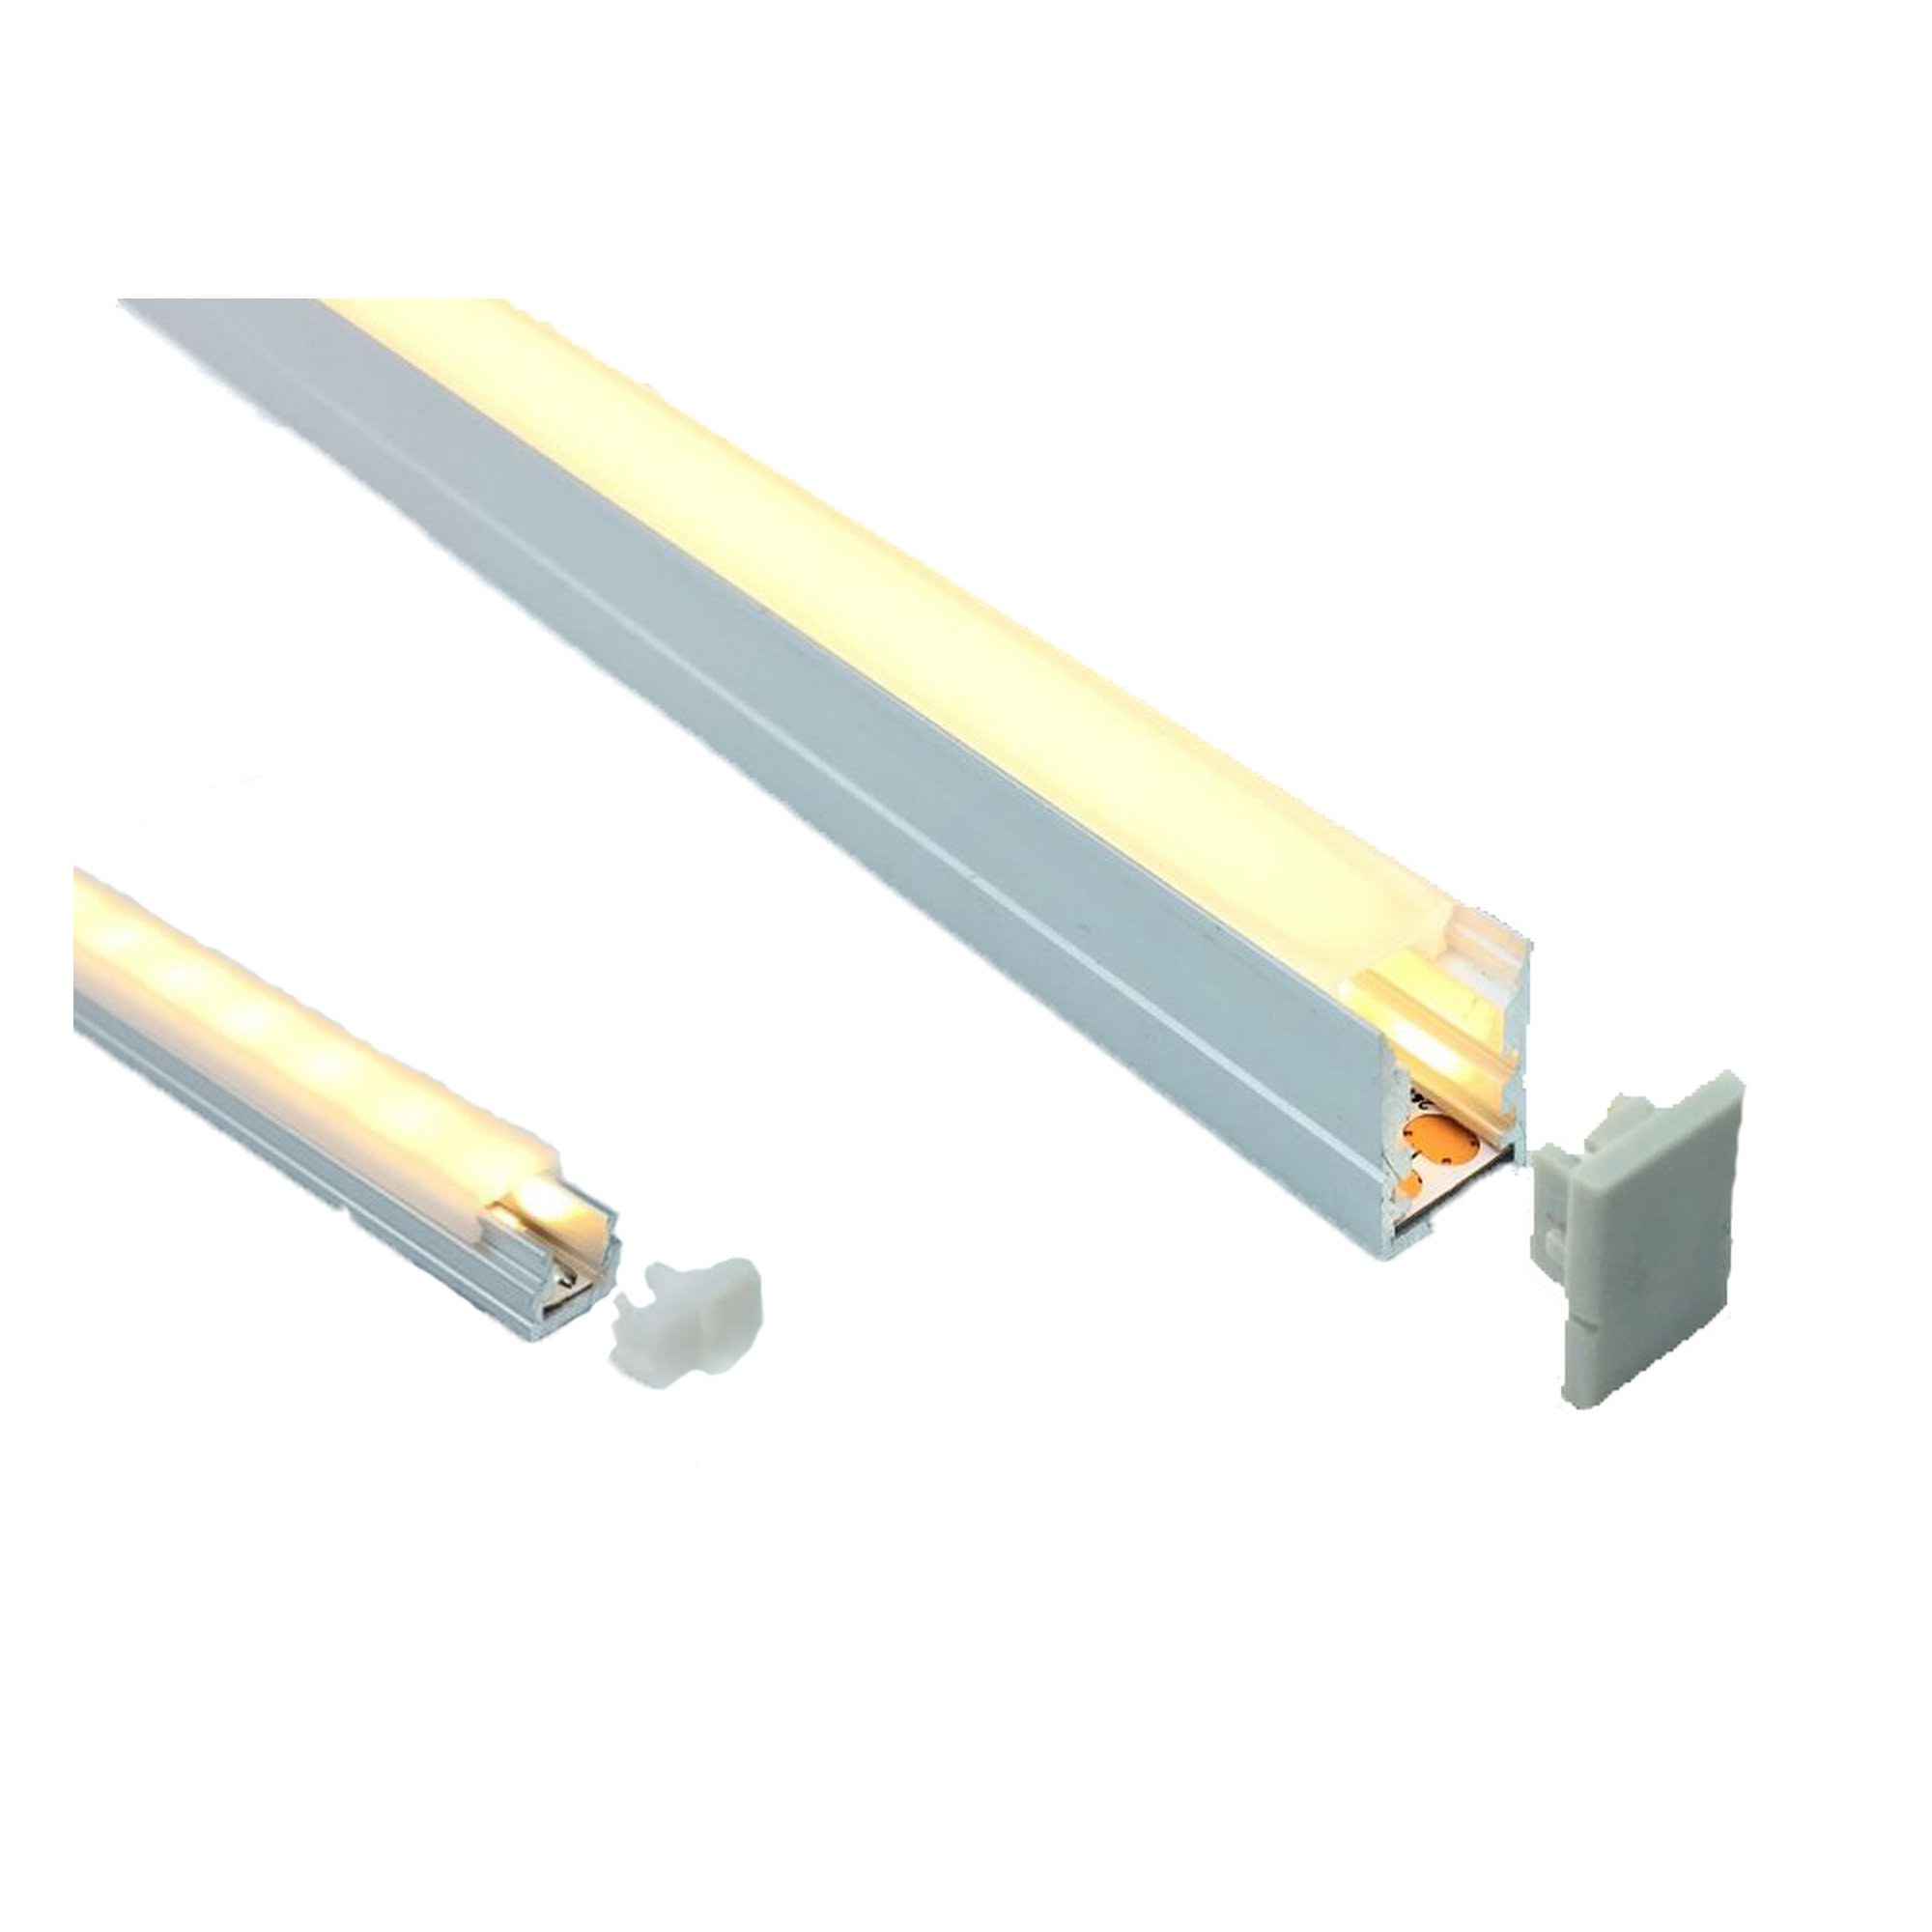 LED profile 10 x 15mm Opal Diffuser Trim